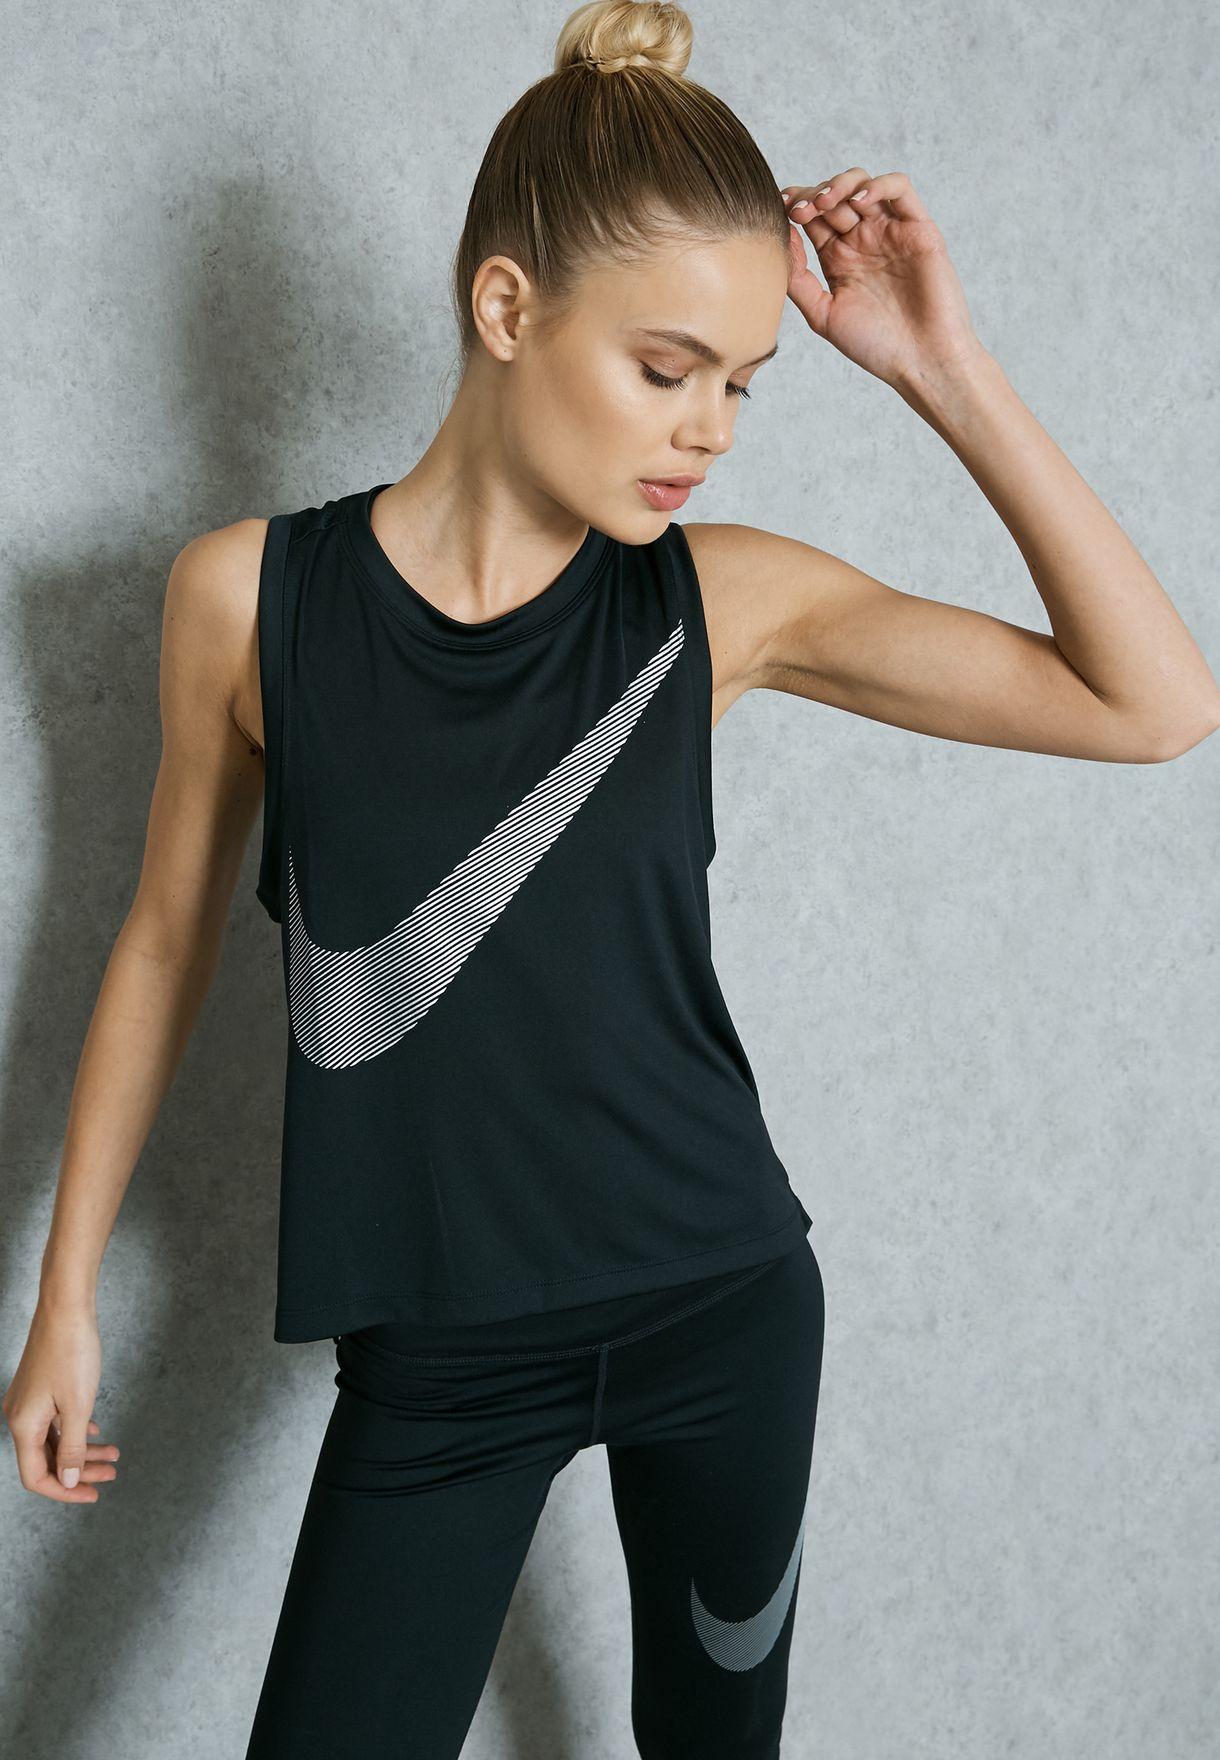 580506f6169d3 Shop Nike black Dri-FIT City Core Tank Top 836793-010 for Women in ...